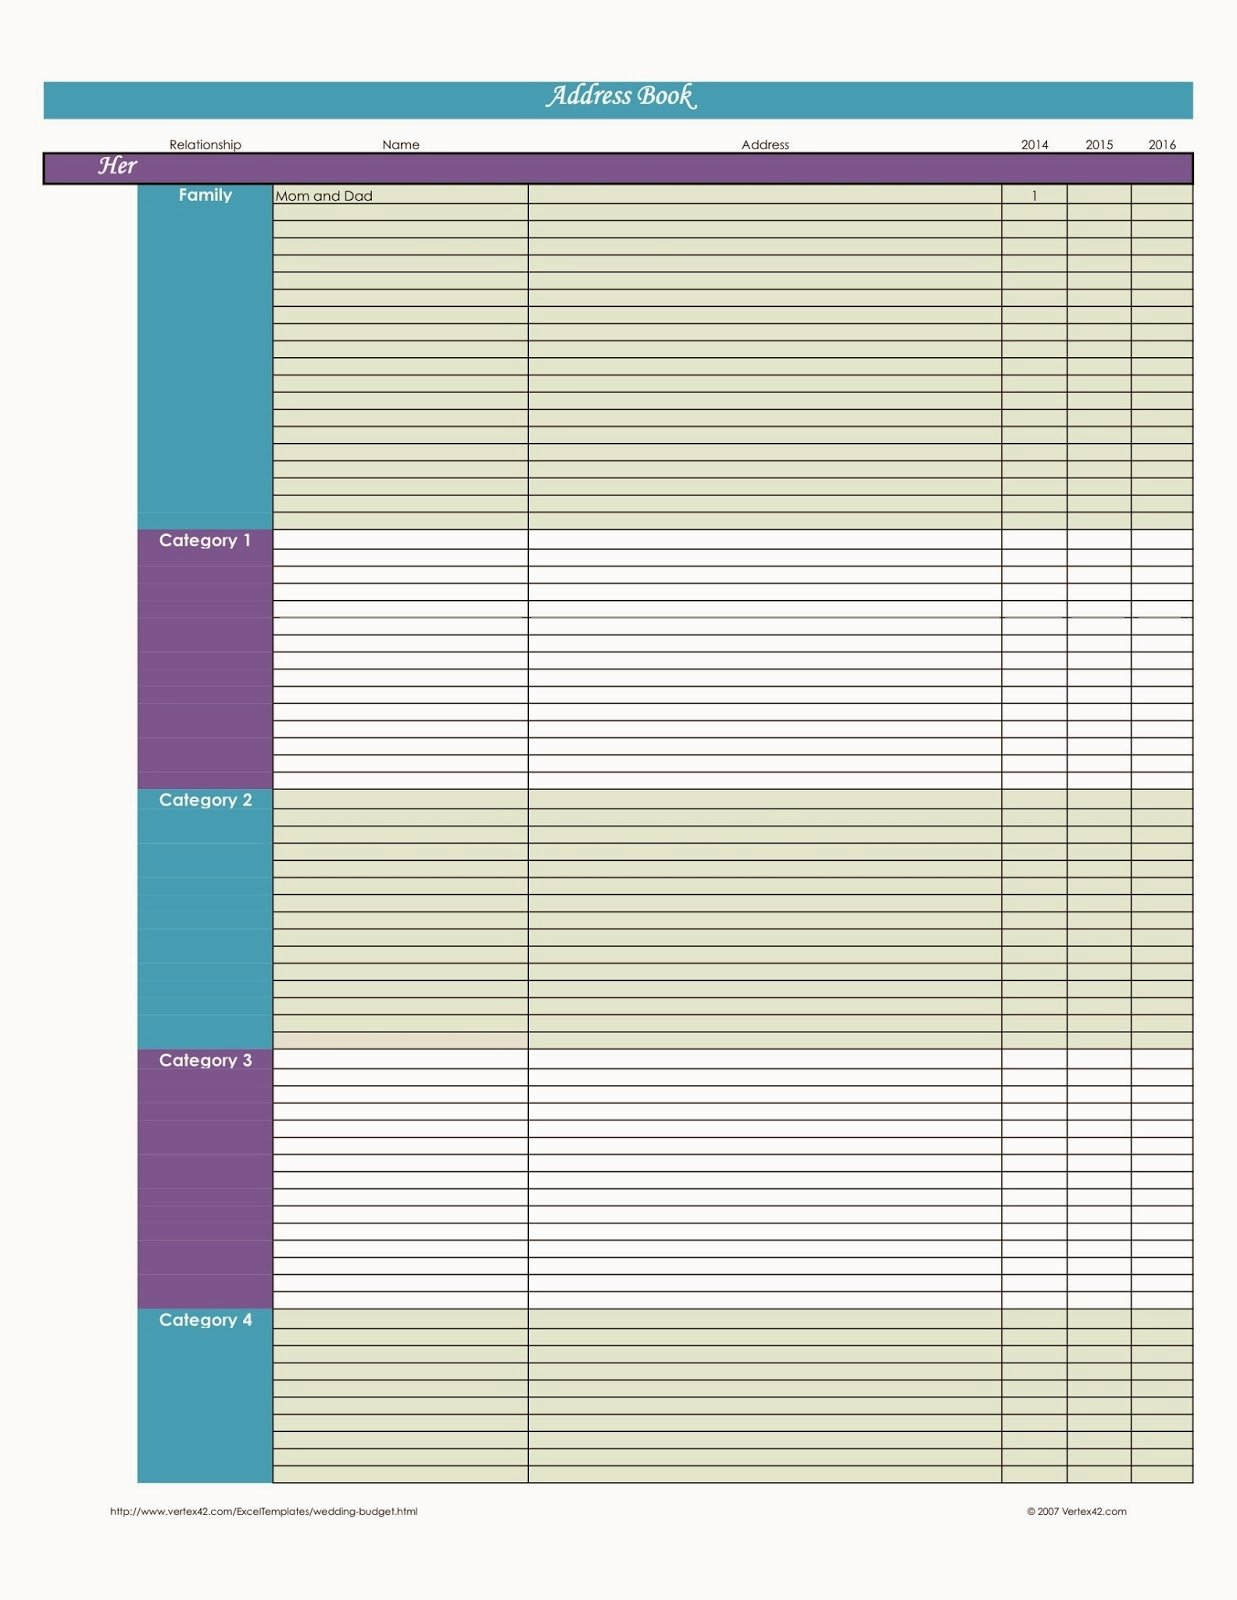 Excel Address Book Template Inspirational Laura S Plans Easy Excel Address Book Template